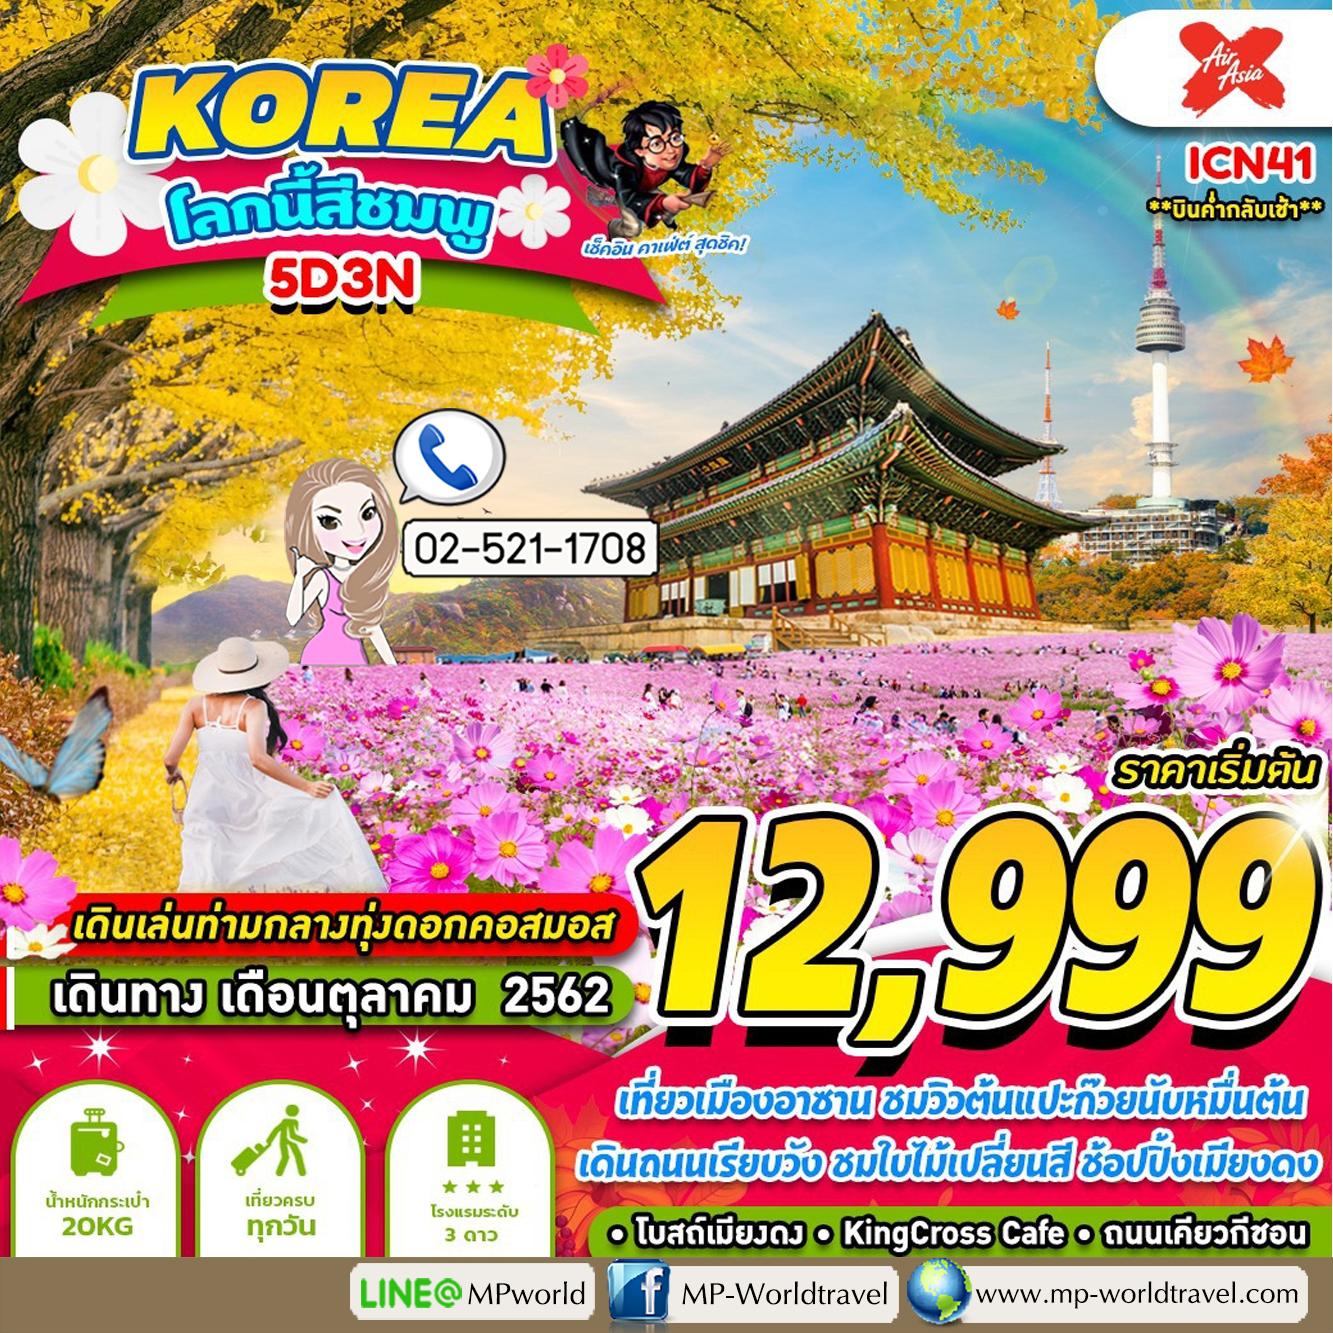 ICN41 KOREA บินค่ำกลับเช้า โลกนี้ สีชมพู 5D 3N XJ